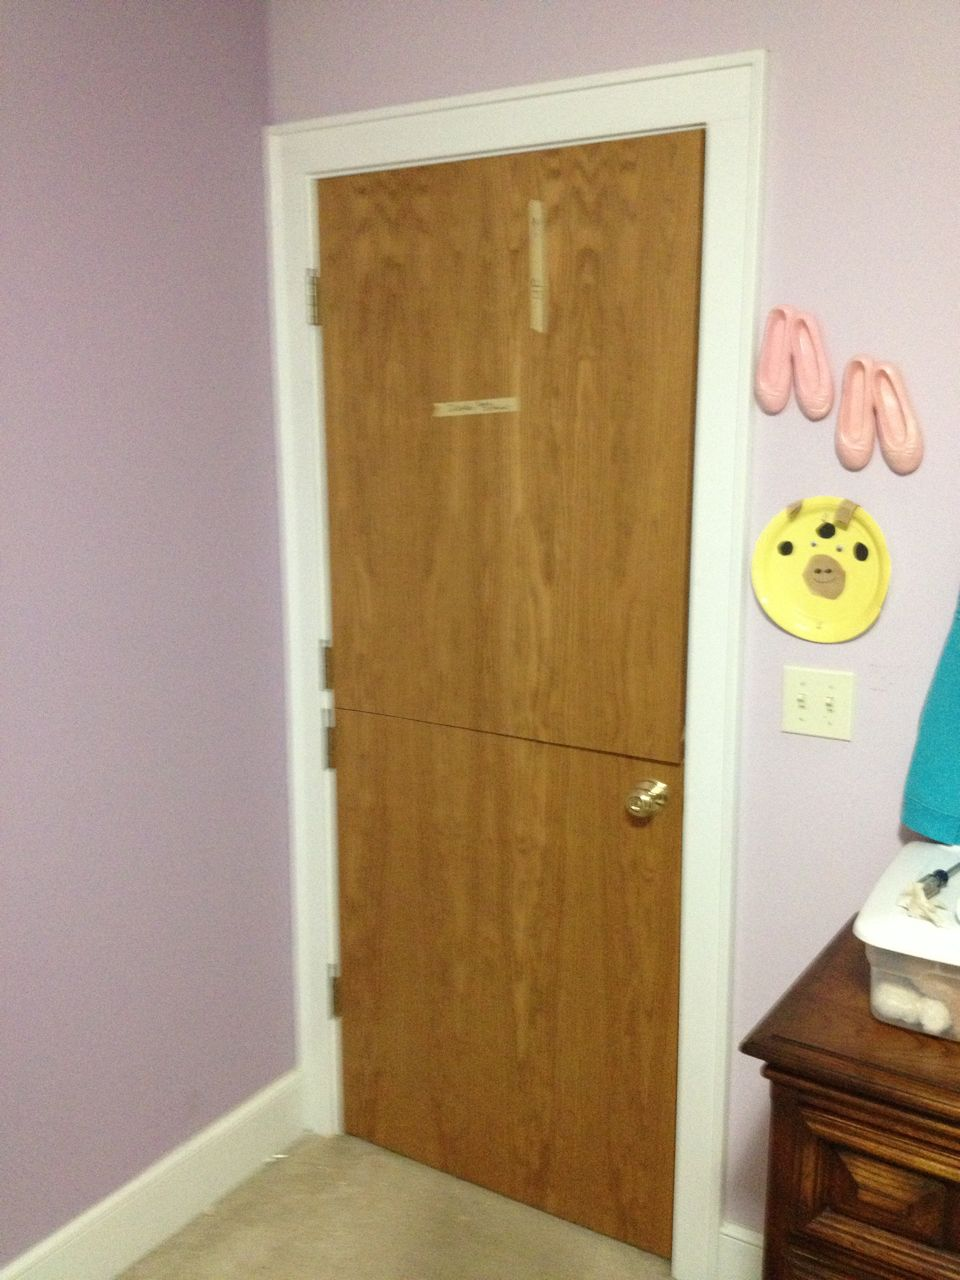 Picture of Mount Door, Knob, and Test